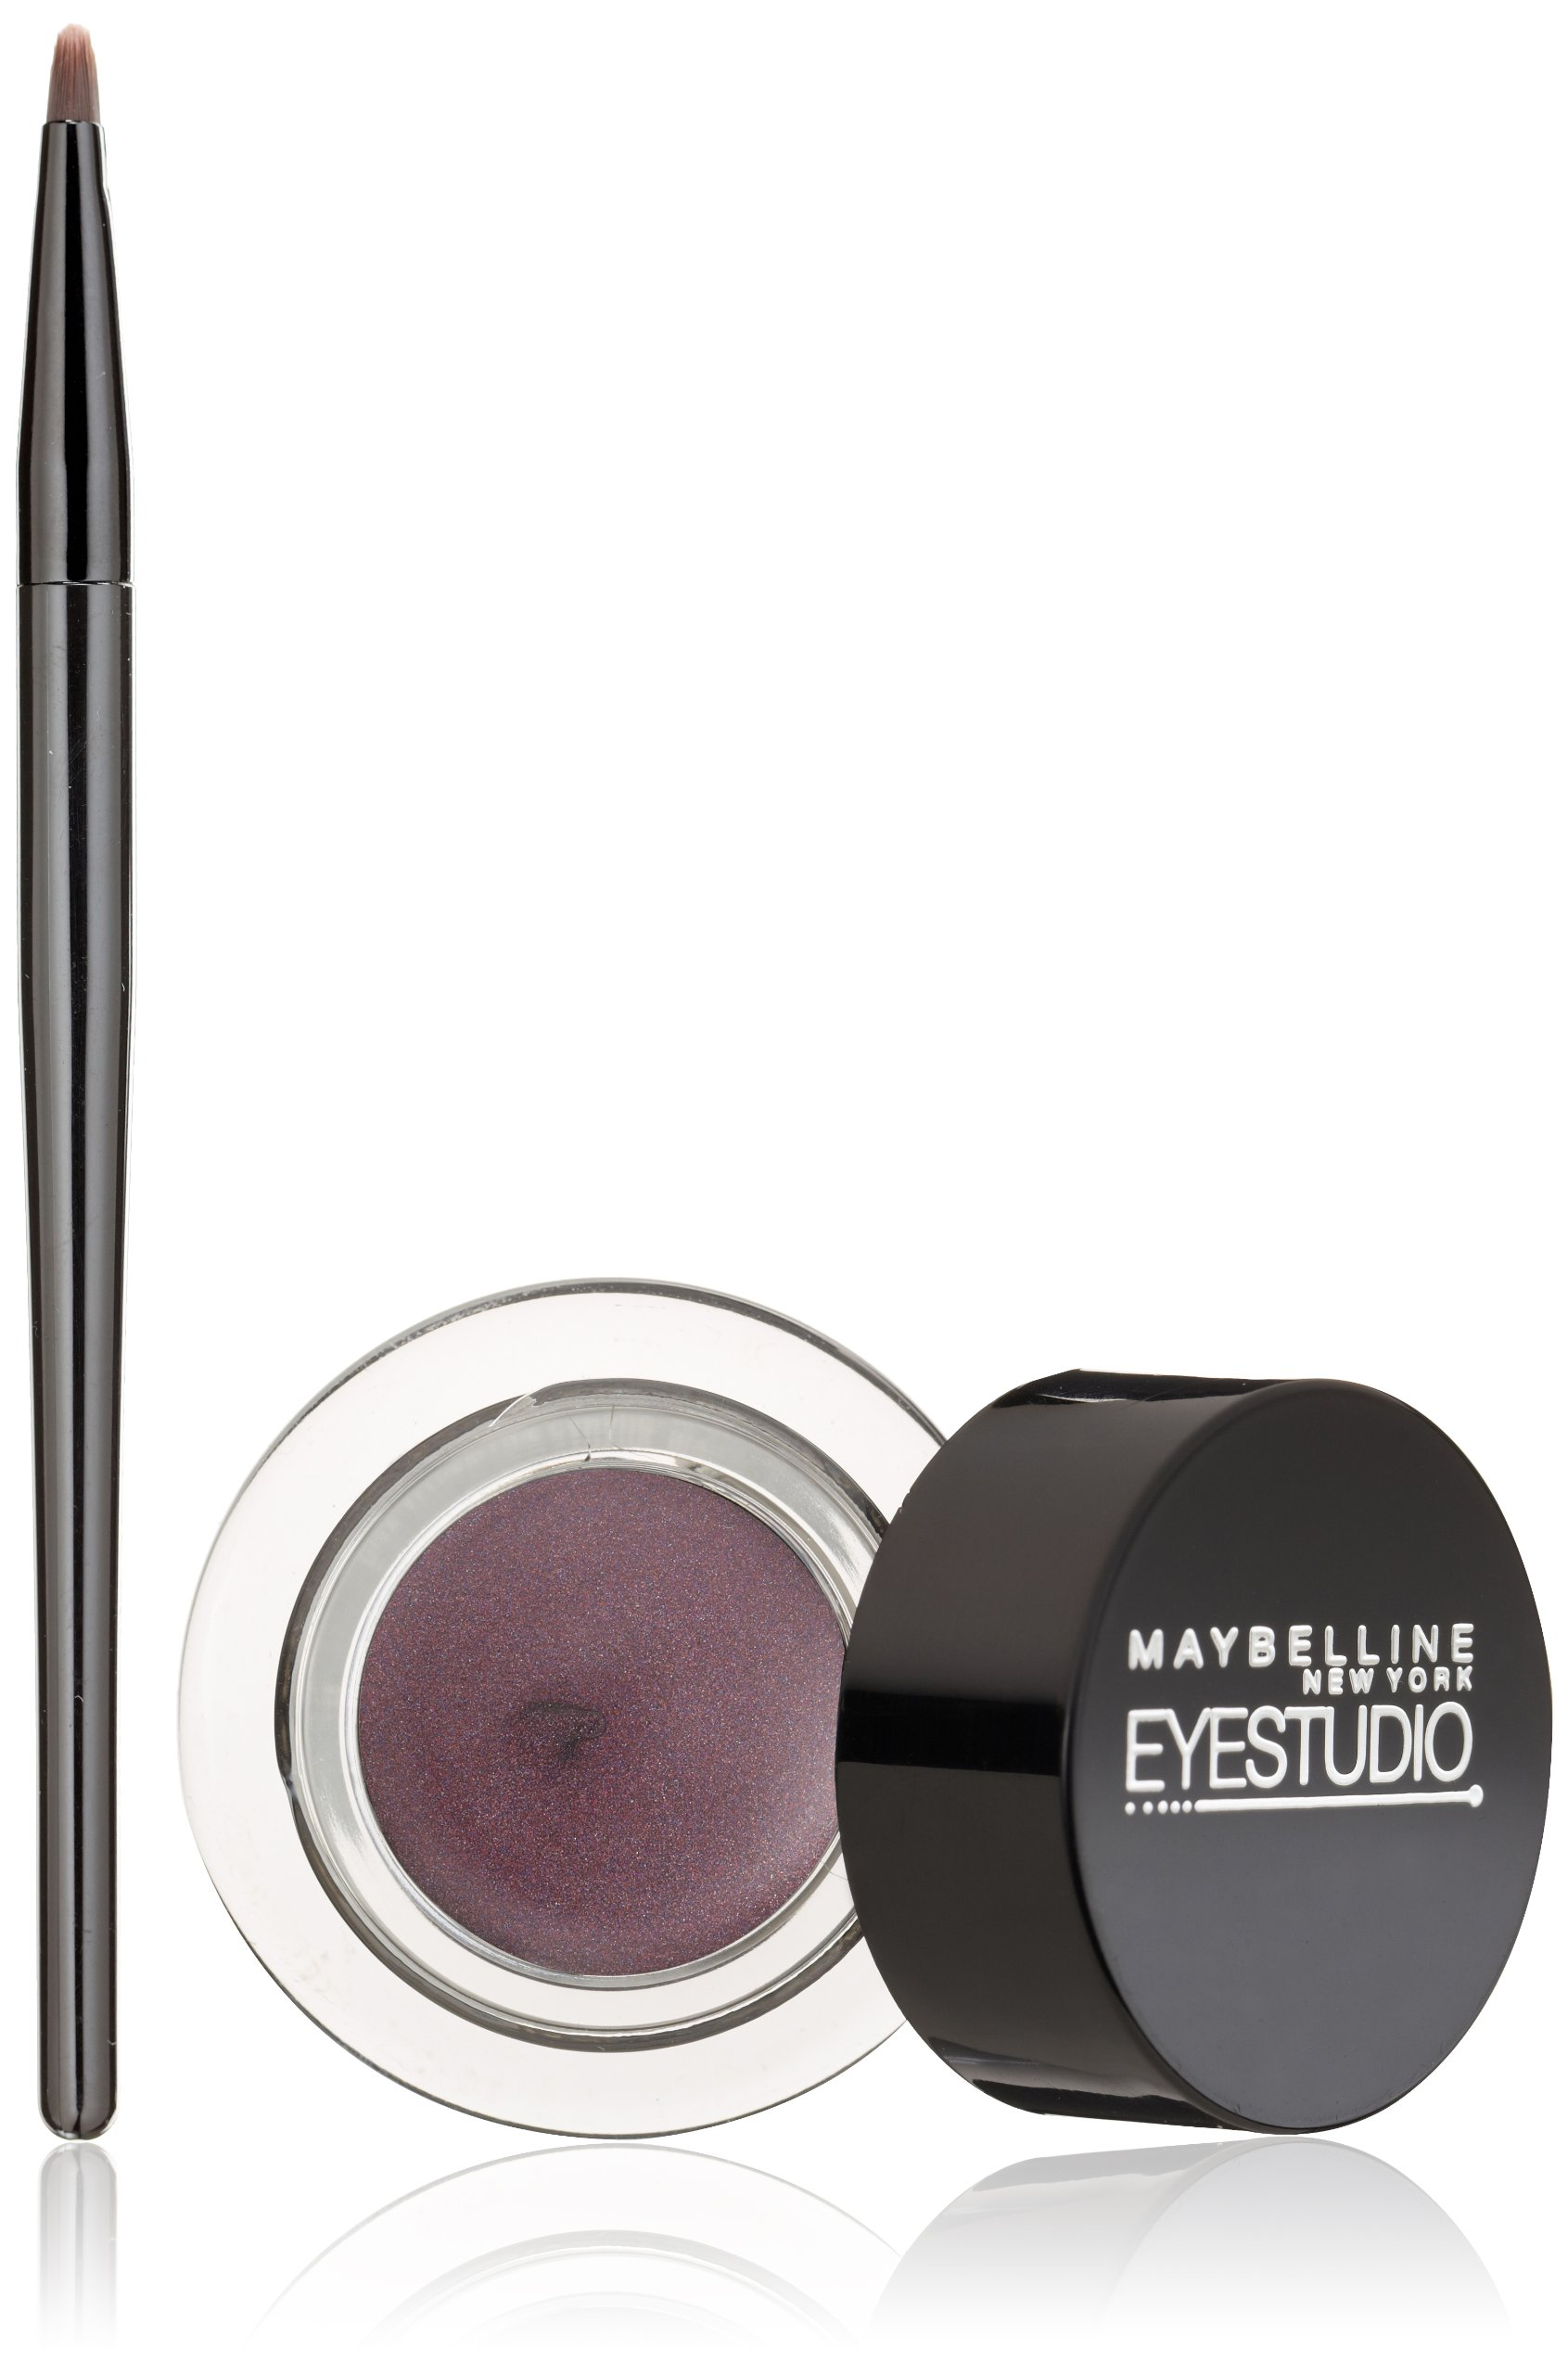 Maybelline New York Eye Studio Lasting Drama Gel Eyeliner, Eggplant 956, 0.106 Ounce